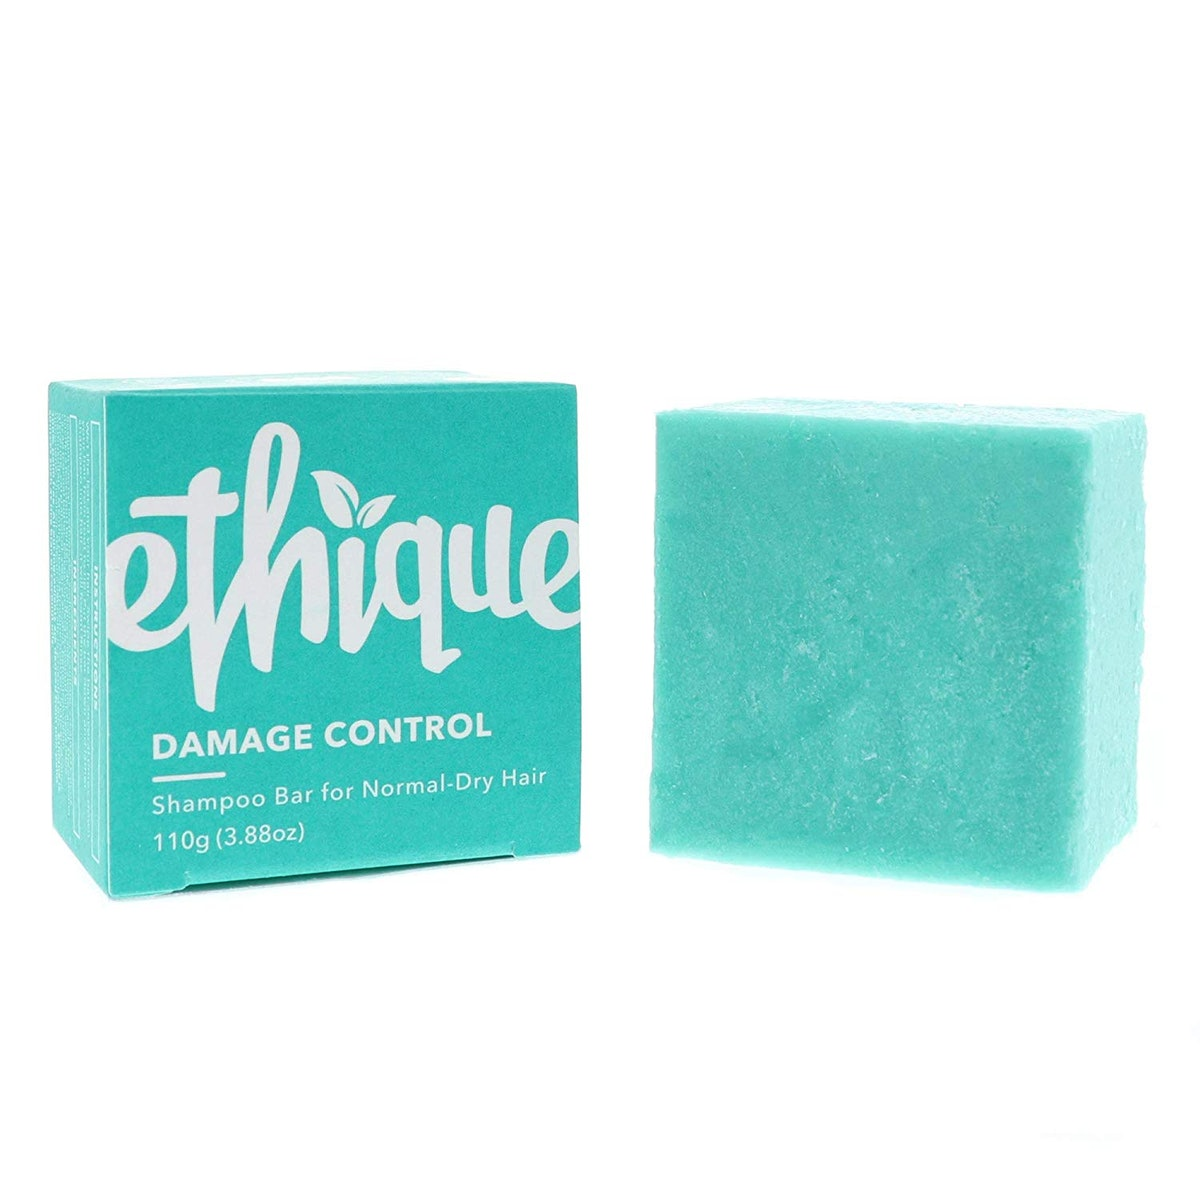 Ethique Damage Control Solid Shampoo Bar